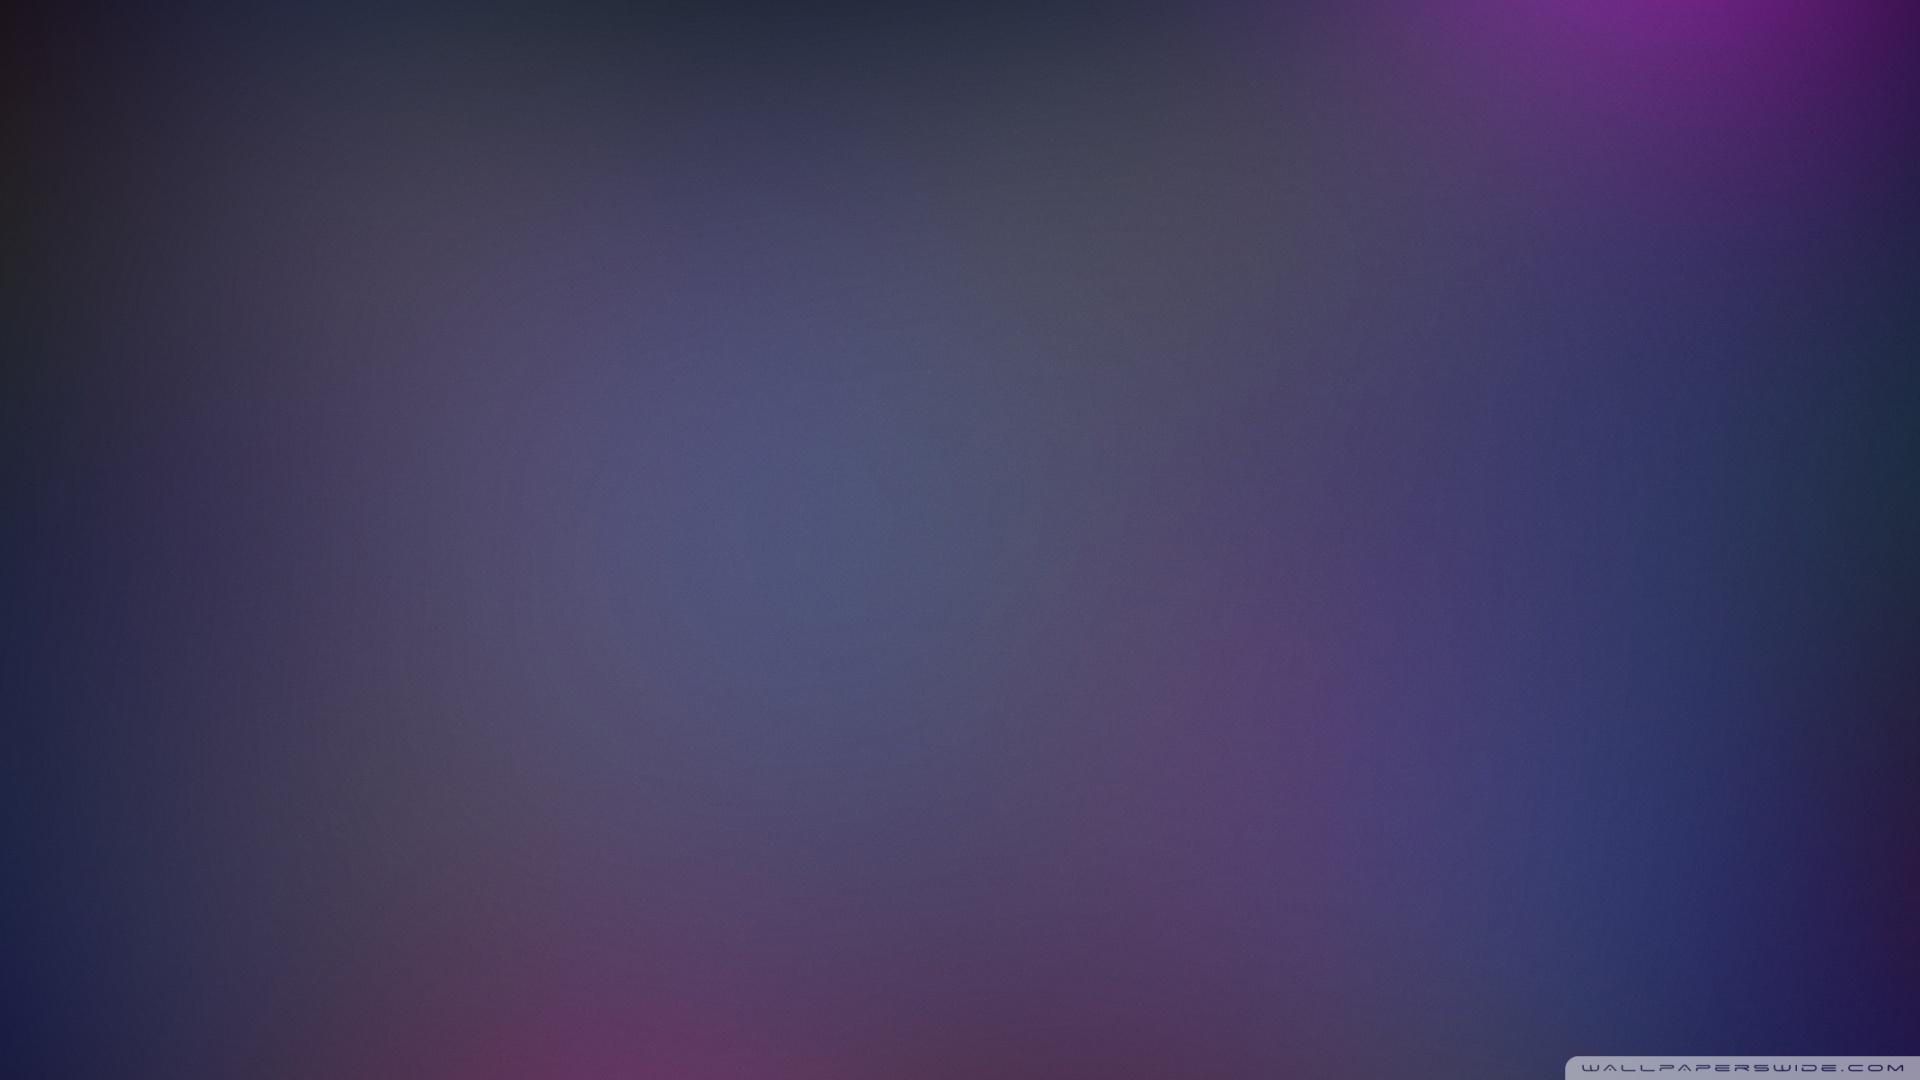 Dark Colors HD desktop wallpaper : High Definition : Fullscreen